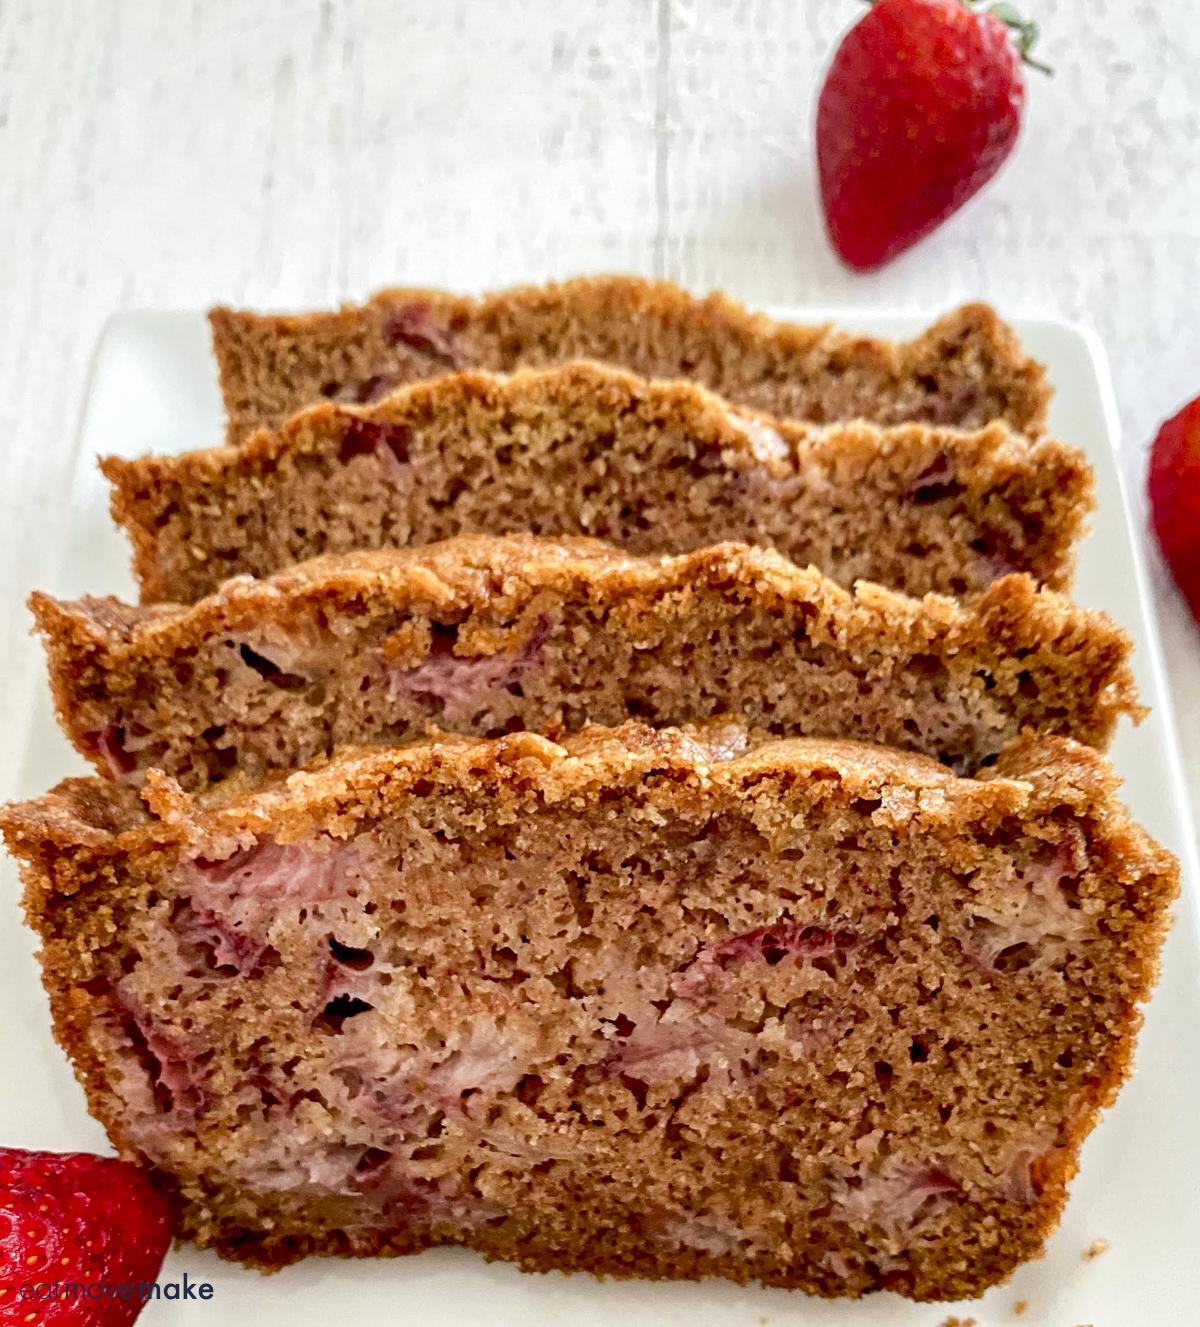 strawberry bread slices